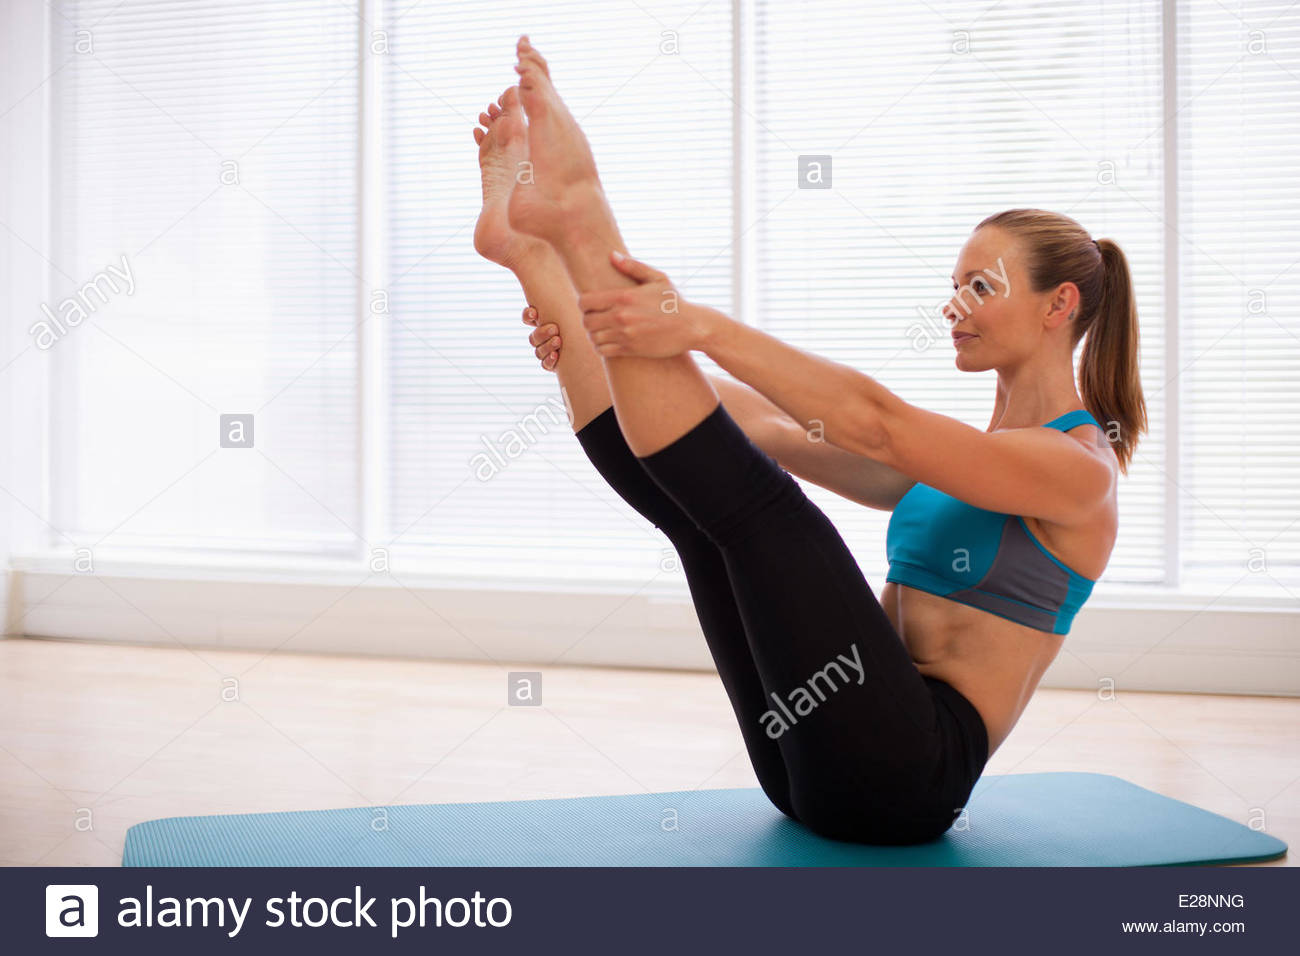 Woman stretching on yoga mat - Stock Image